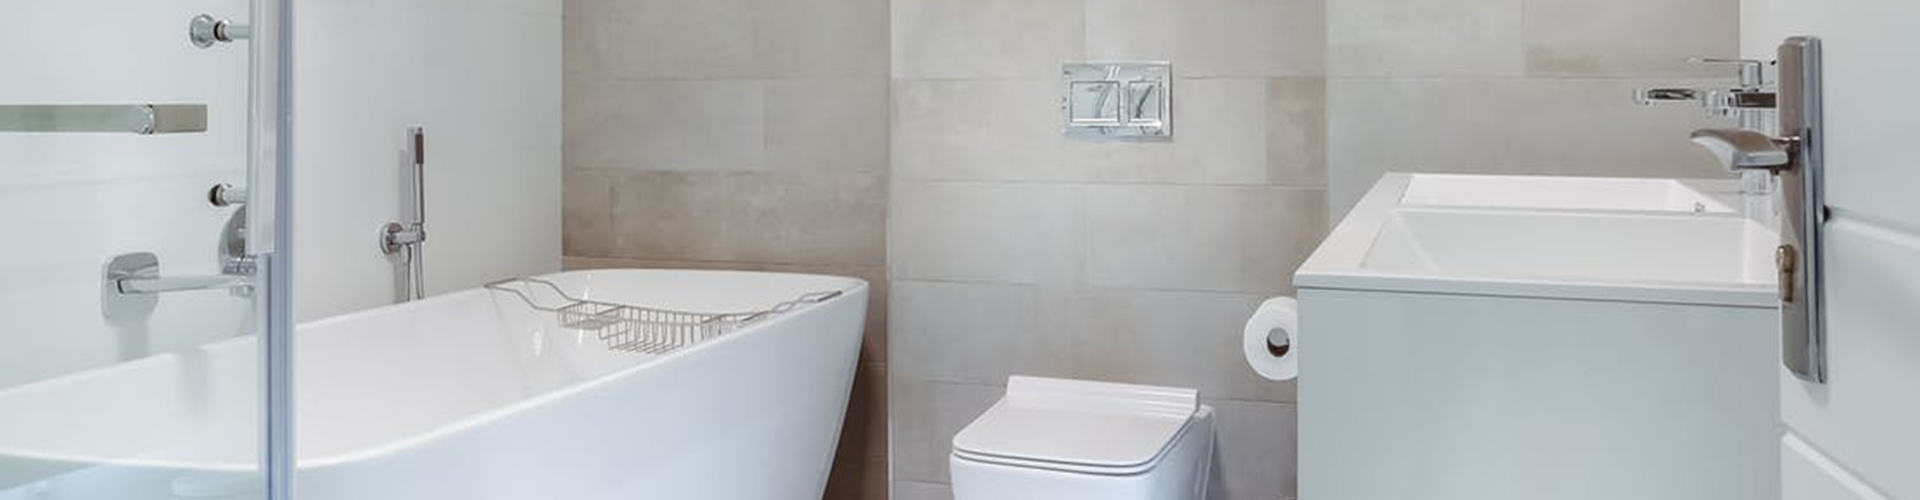 Important bathroom details